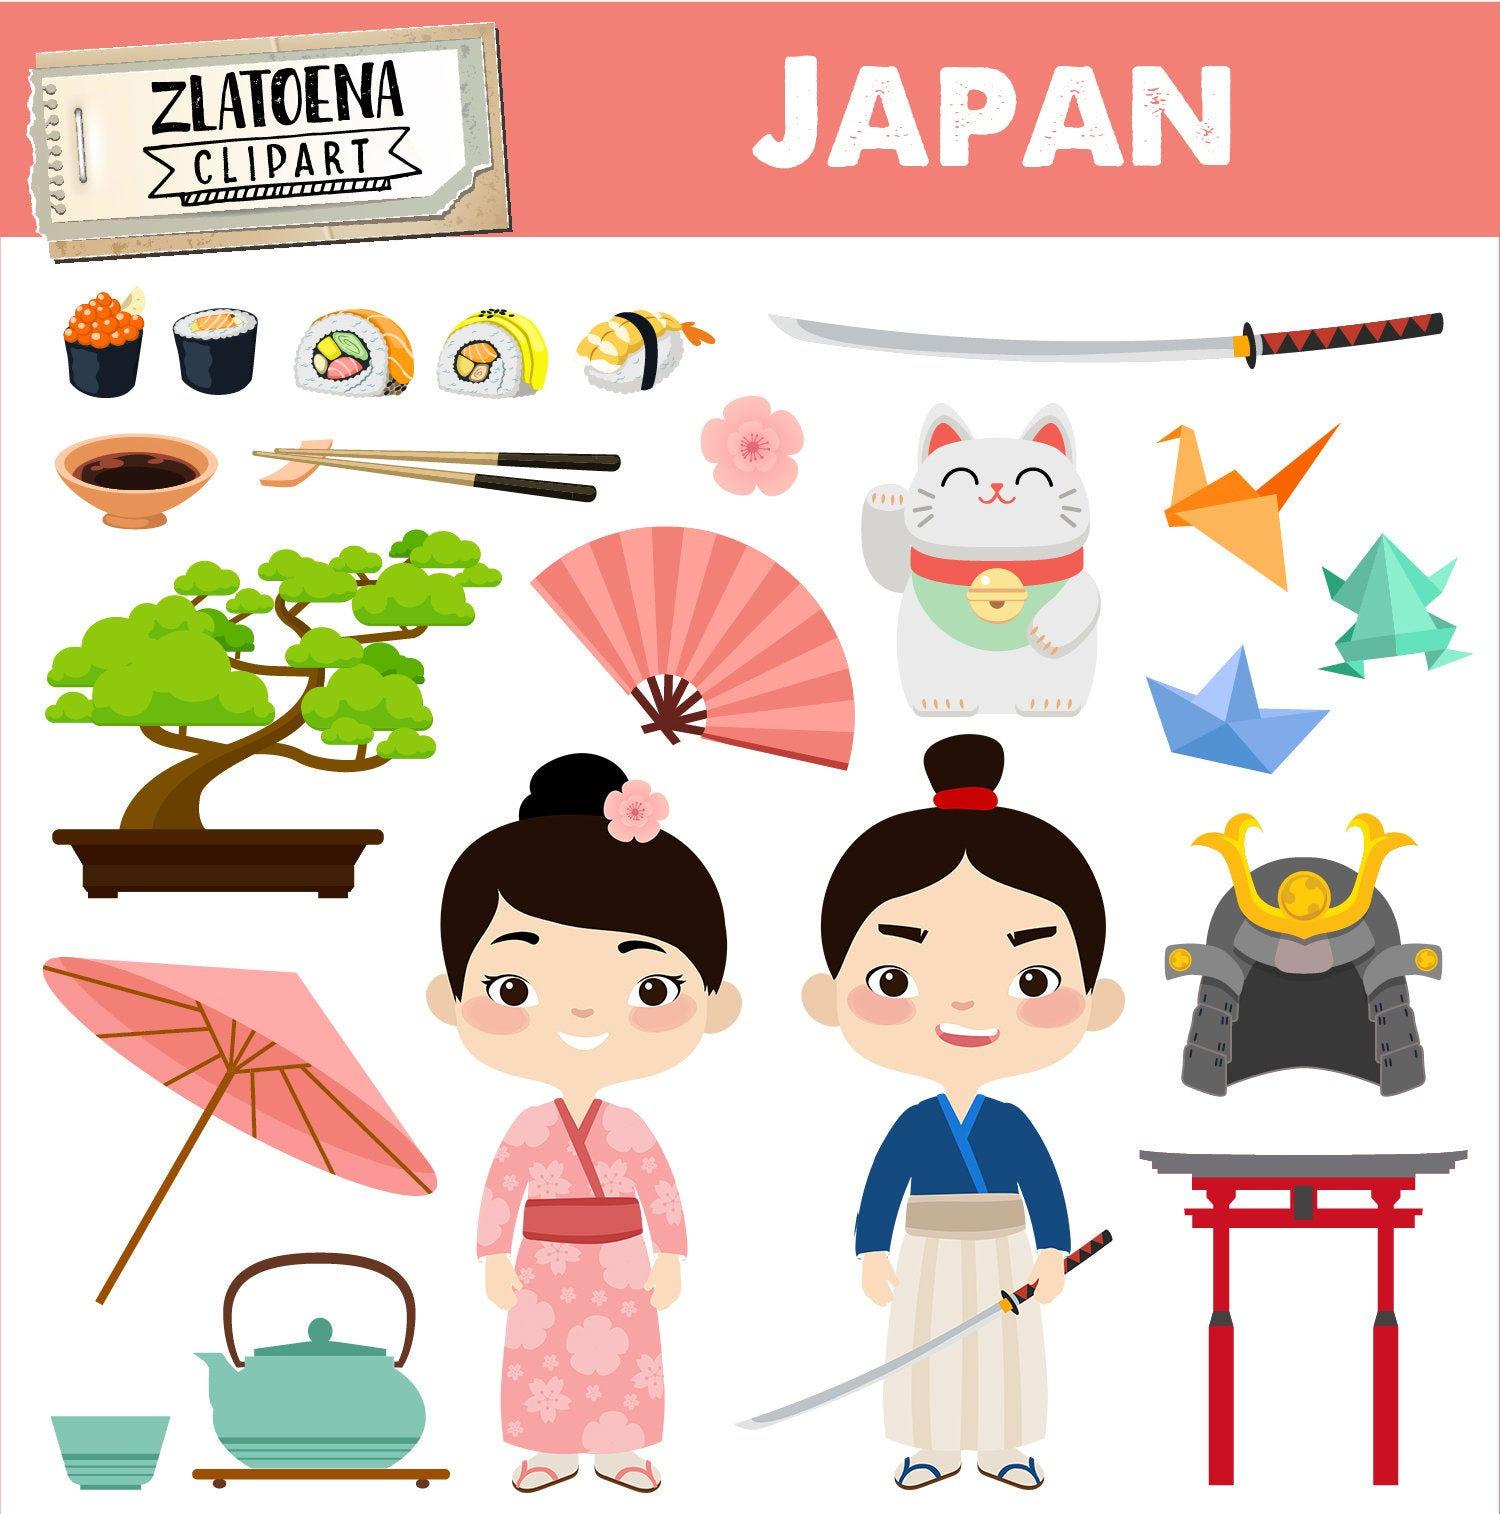 Japan clipart Japanese clip art Geisha Samurai clipart Asia graphics Kimono  clipart Kawaii clip art Japanese Princess Clipart Cherry Blossom.